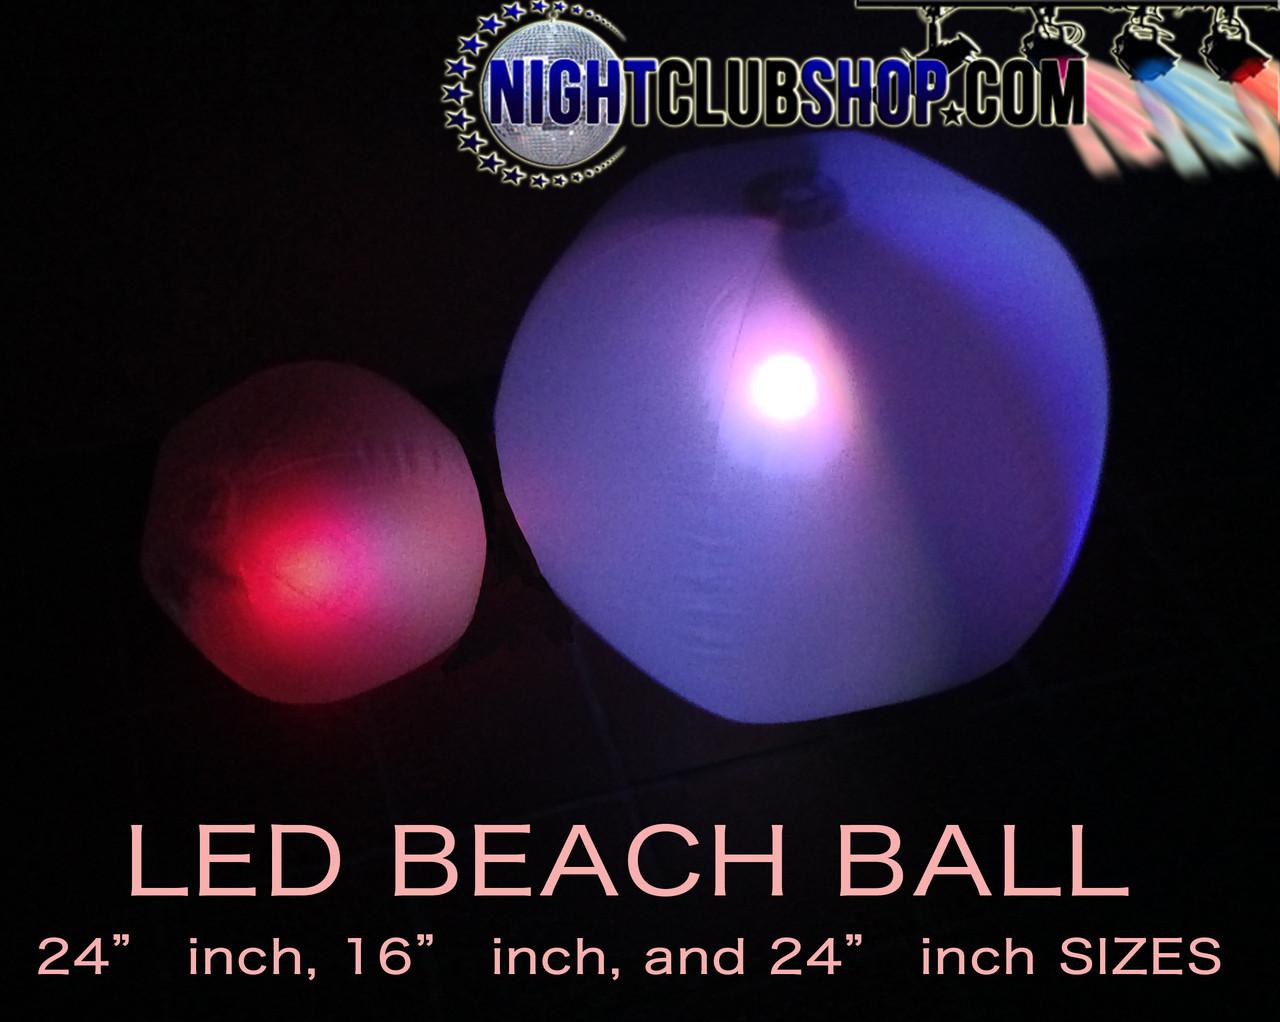 LED BEACH BALL 82 INCH CADILLAC VERSION (Giant LED BEACHBALL)